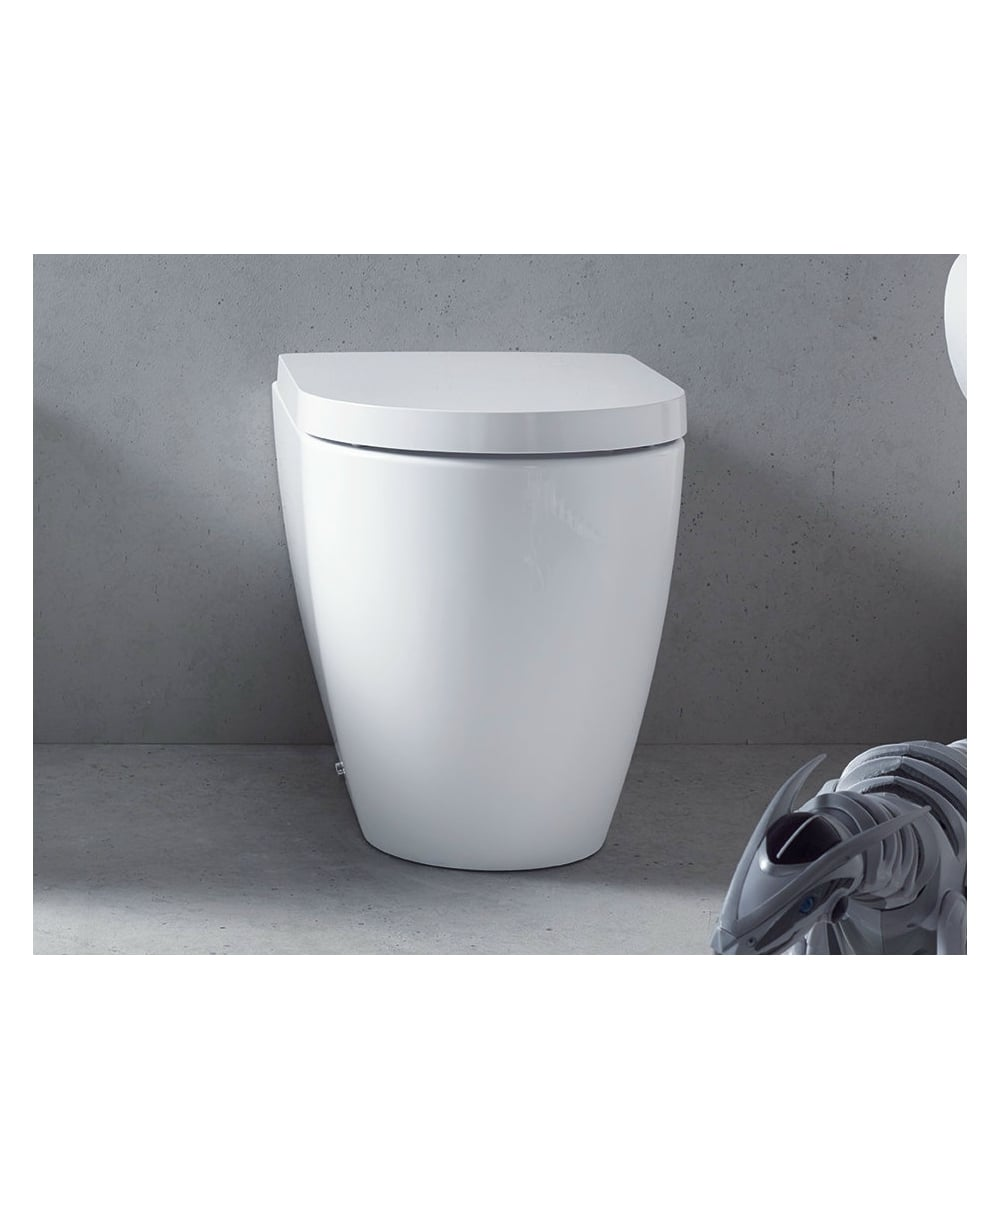 villeroy boch wc splrandlos amazing wc bidet in ceramica. Black Bedroom Furniture Sets. Home Design Ideas